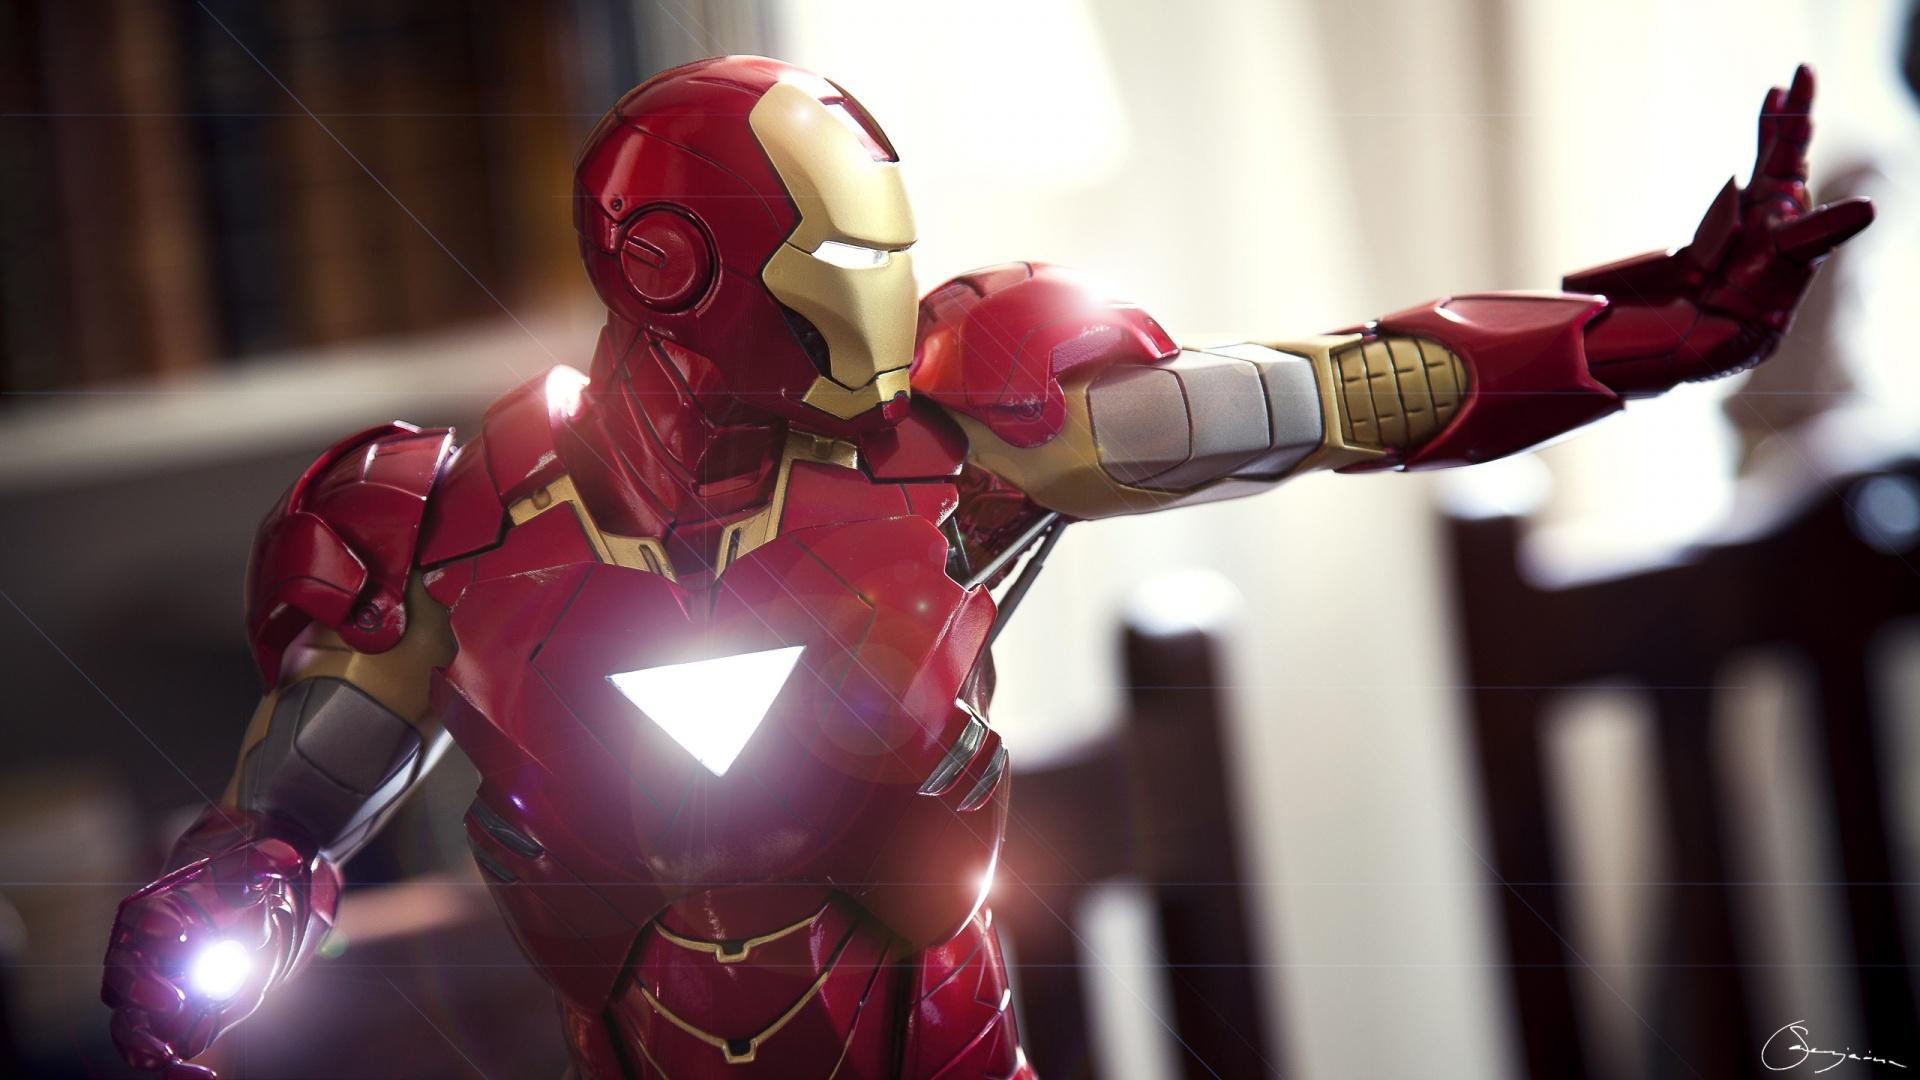 70 Iron Man Suits Wallpaper On Wallpapersafari